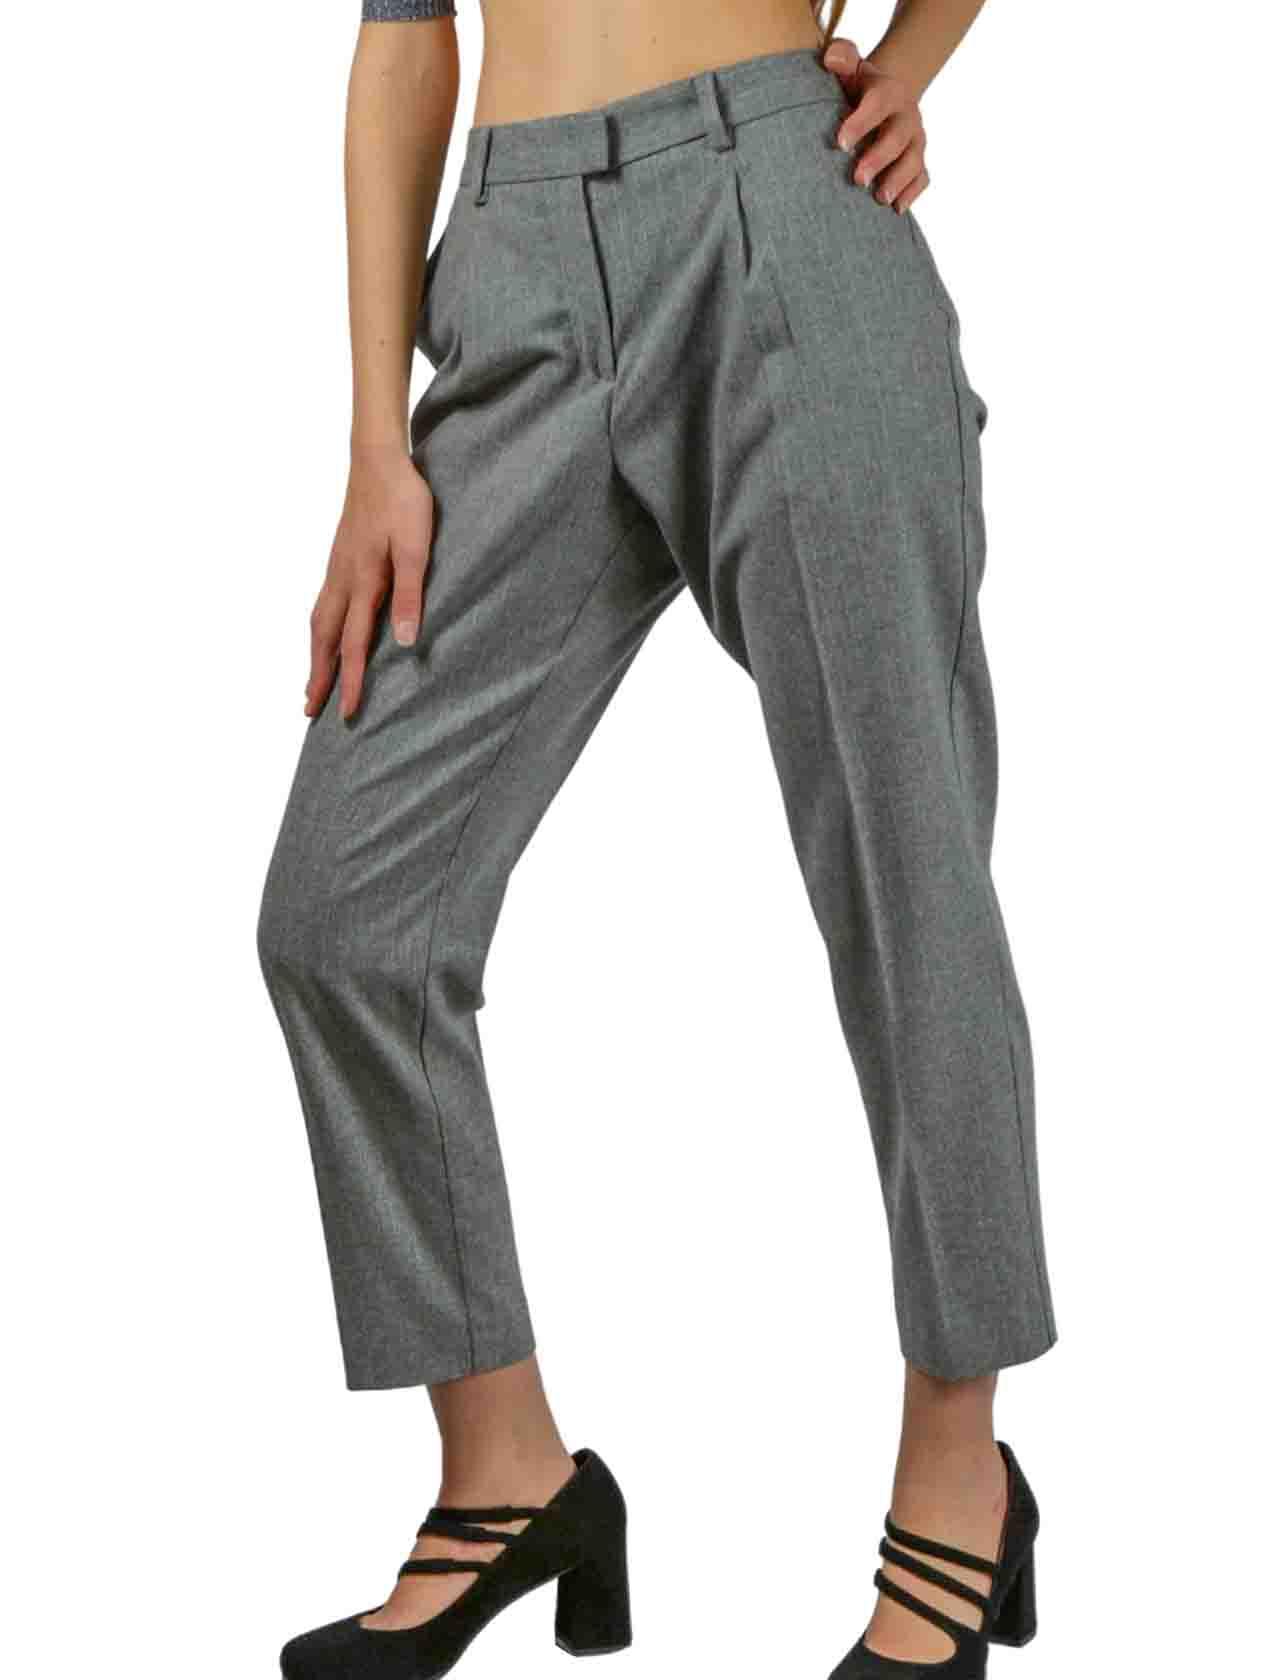 Pantalone Donna Grigio Maliparmi | Gonne e Pantaloni | JH70532018721011